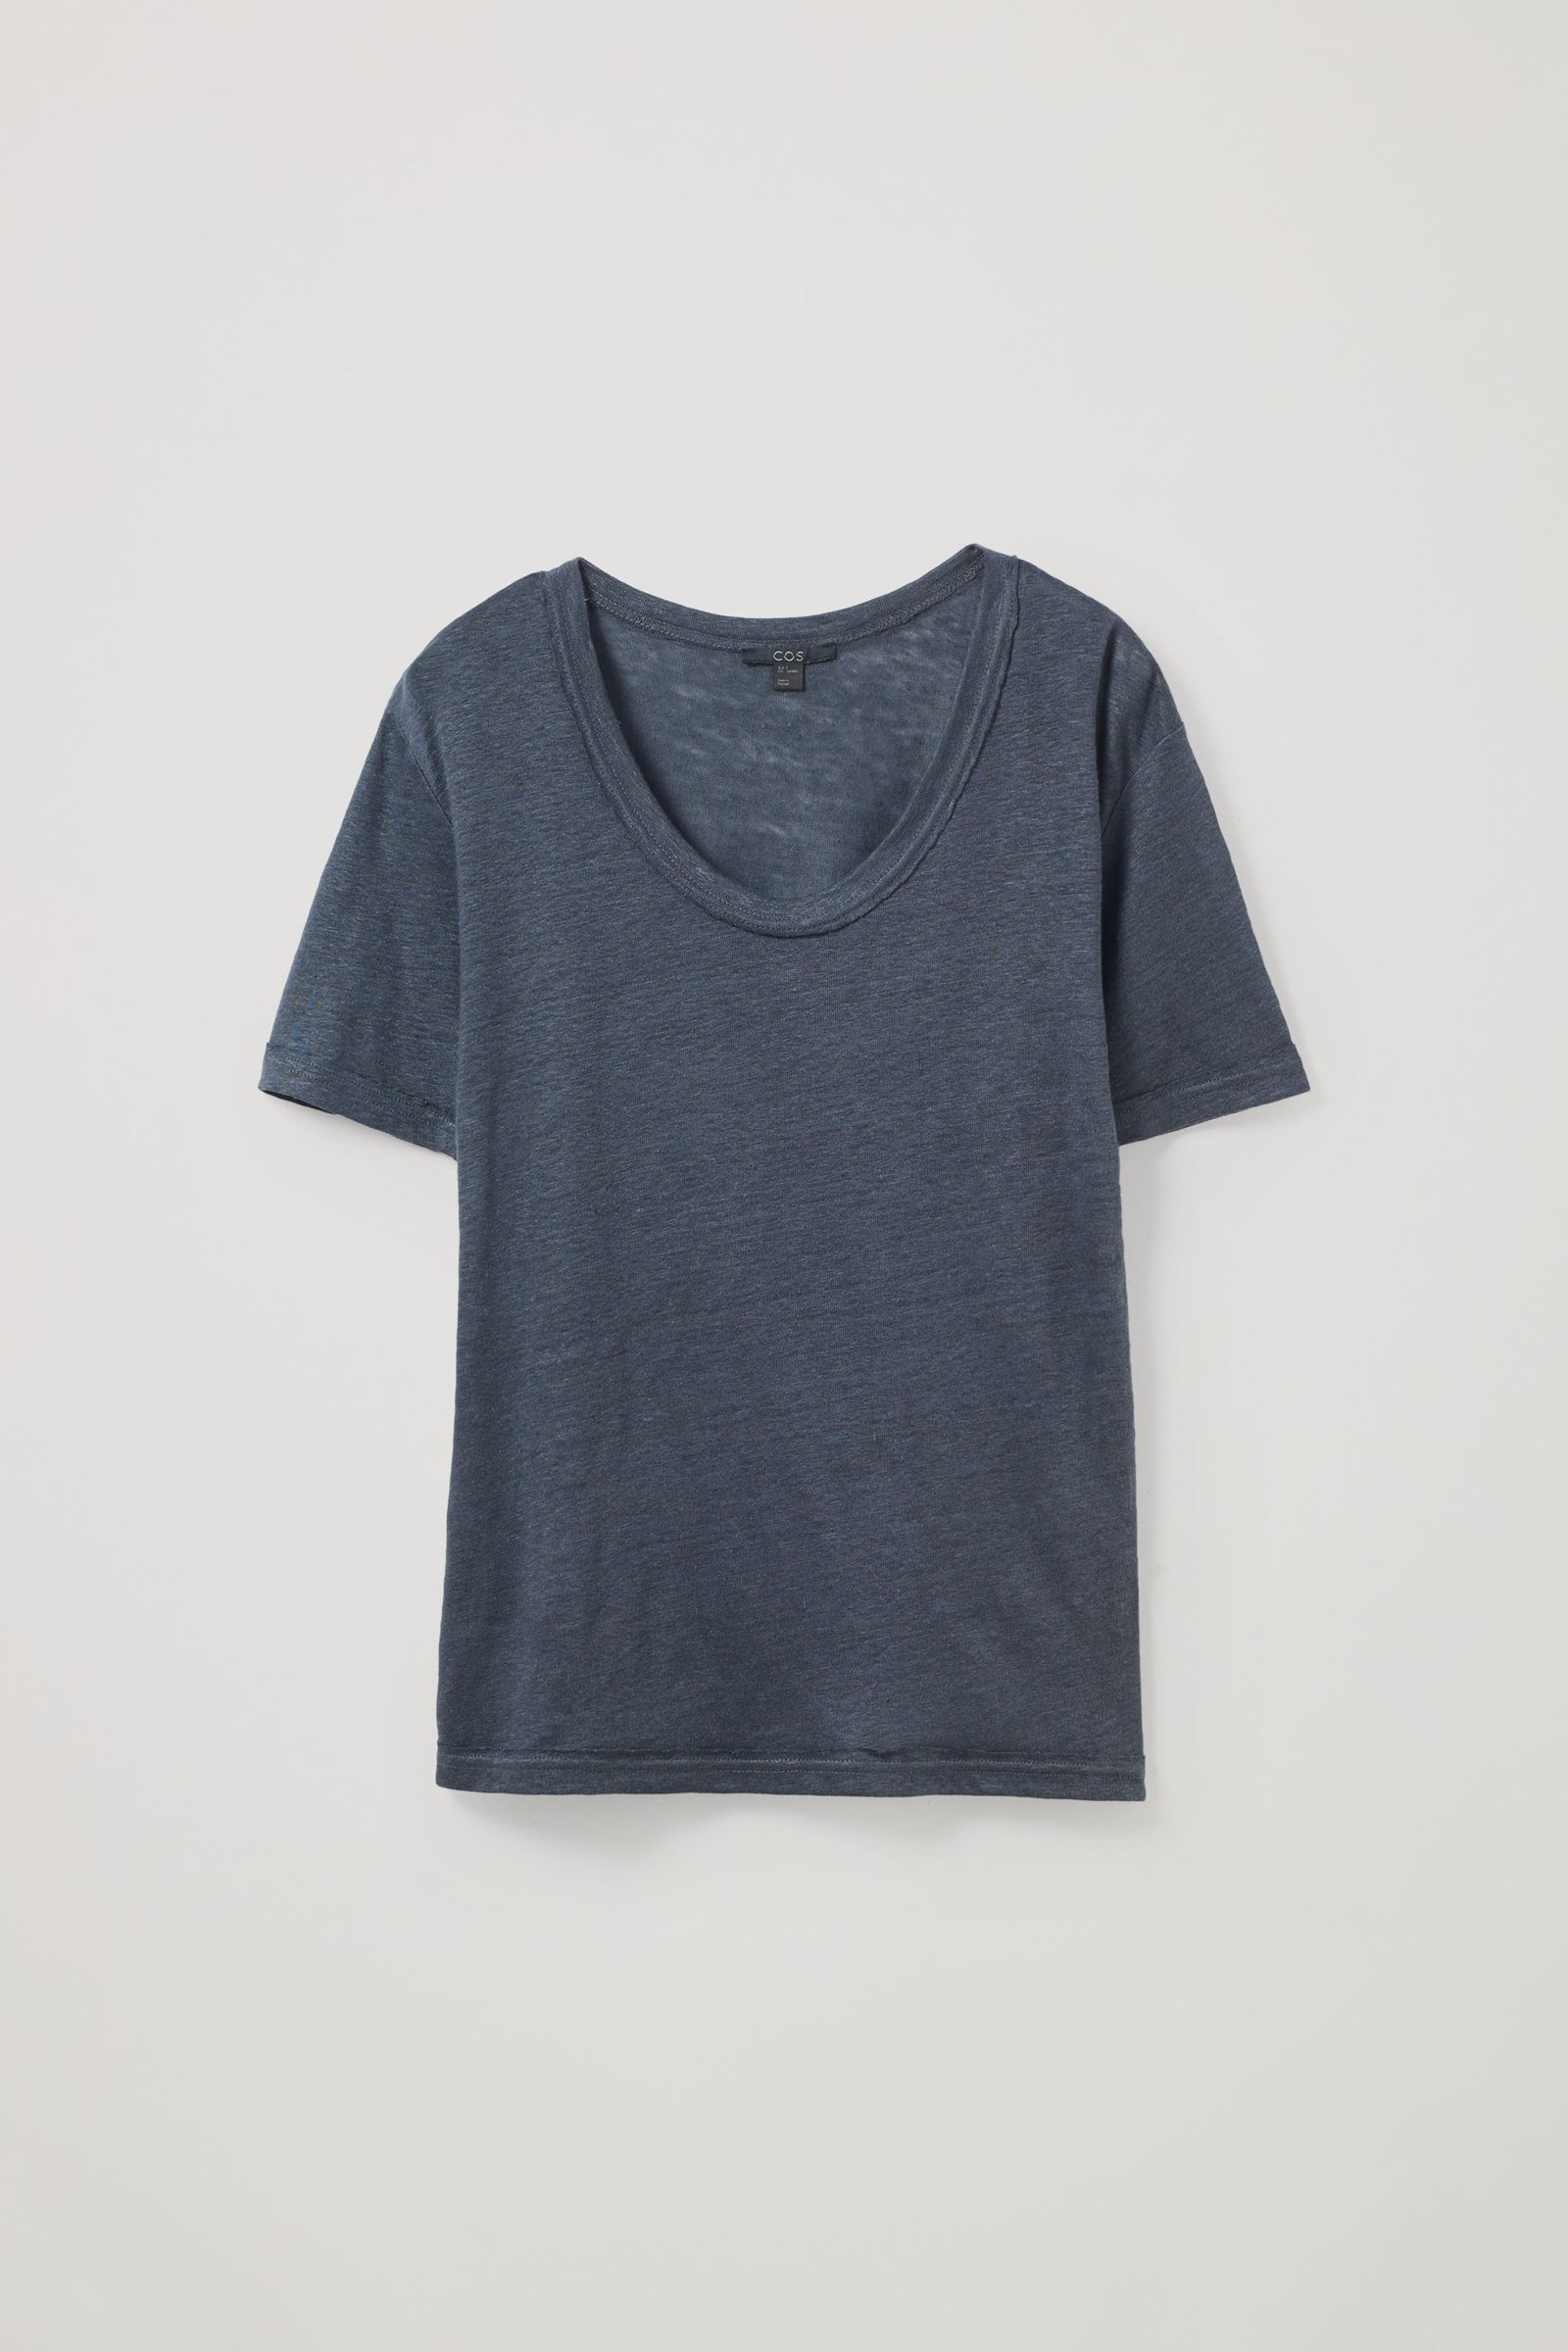 COS 로 엣지 리넨 티셔츠의 다크 그레이컬러 Product입니다.